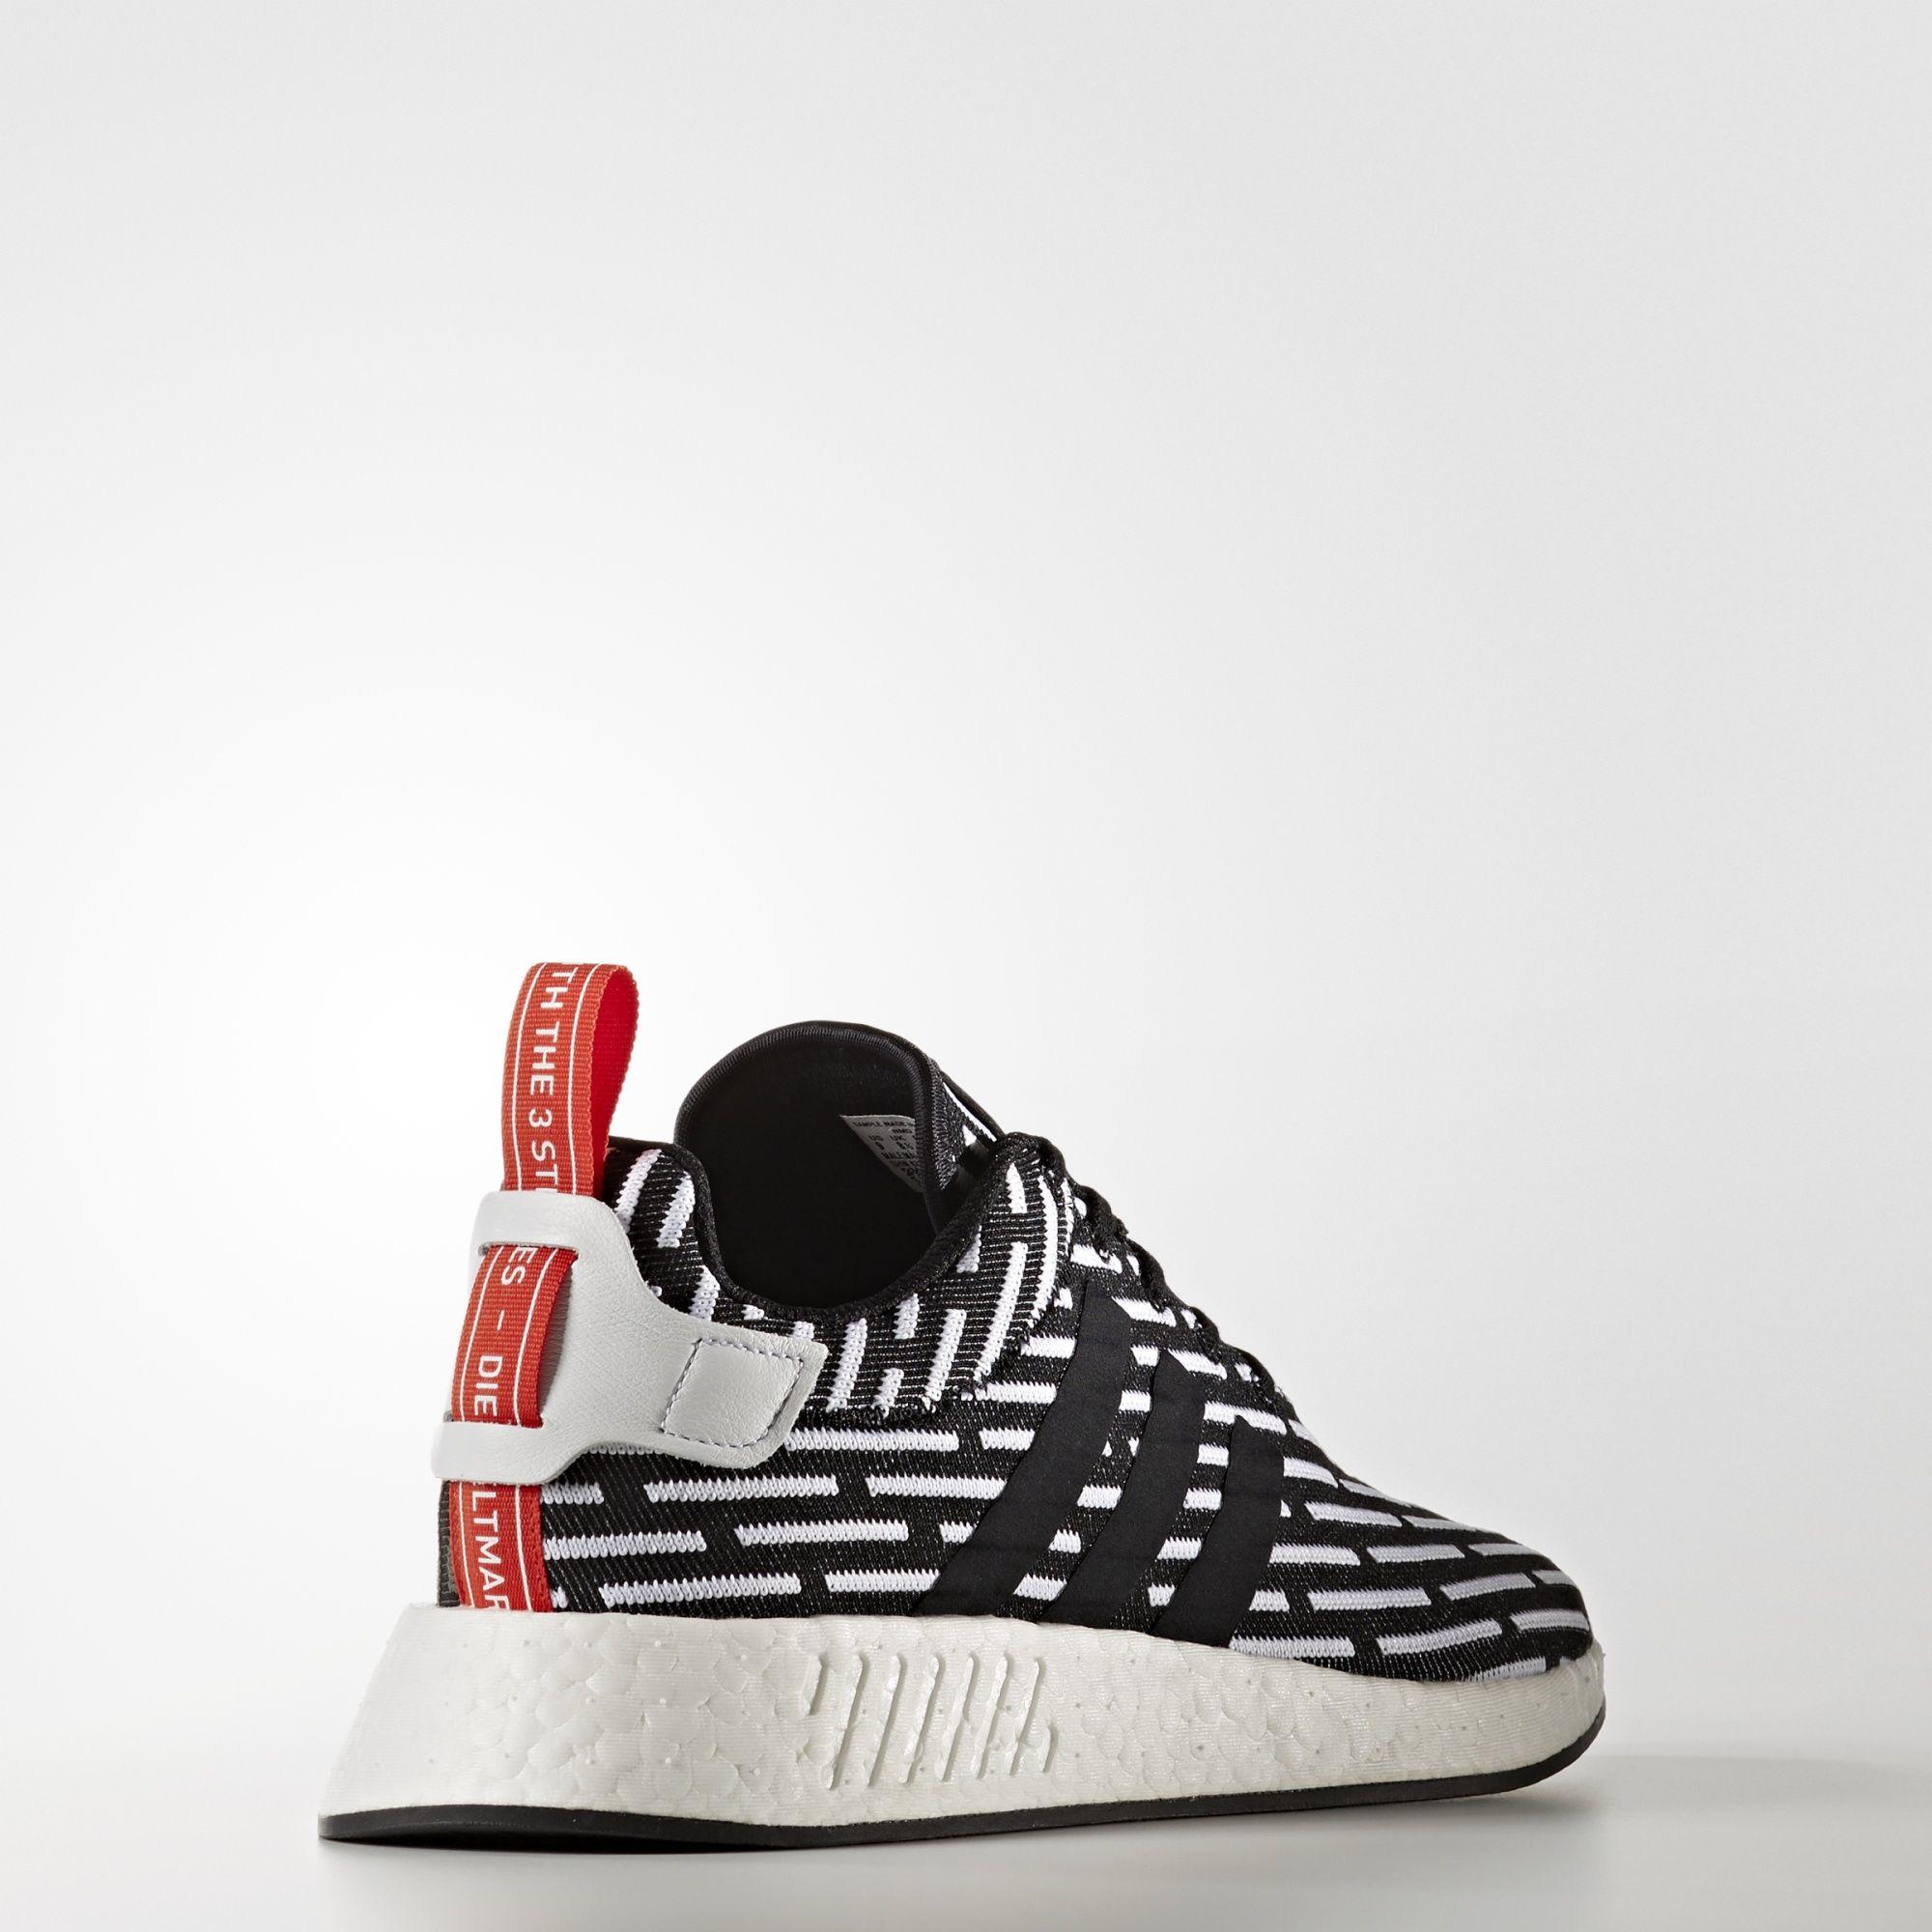 adidas nmd r2 primeknit Zebra BB2951 4